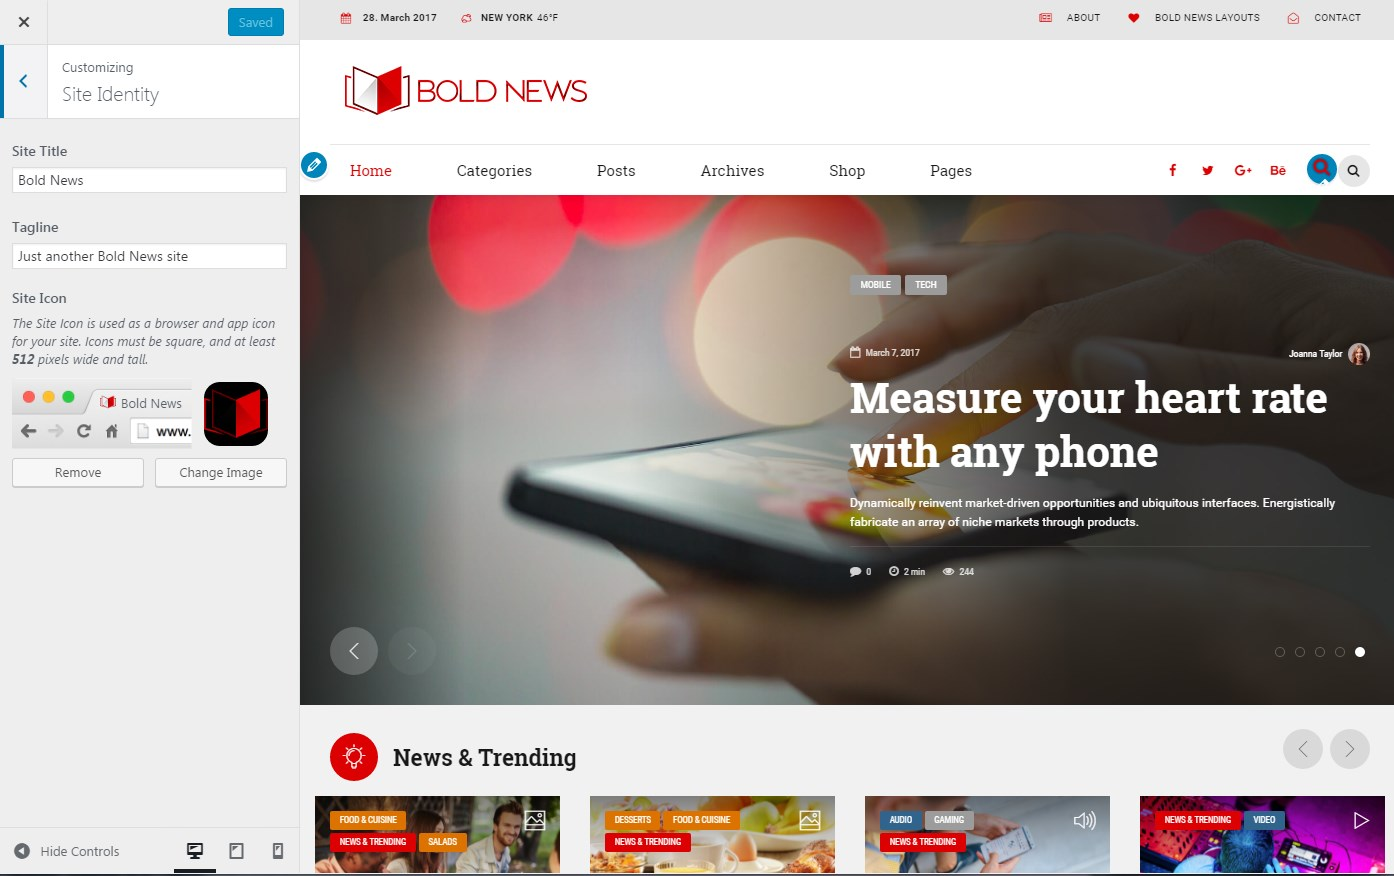 https://documentation.bold-themes.com/bold-news/wp-content/uploads/sites/14/2016/07/19-1-1.jpg